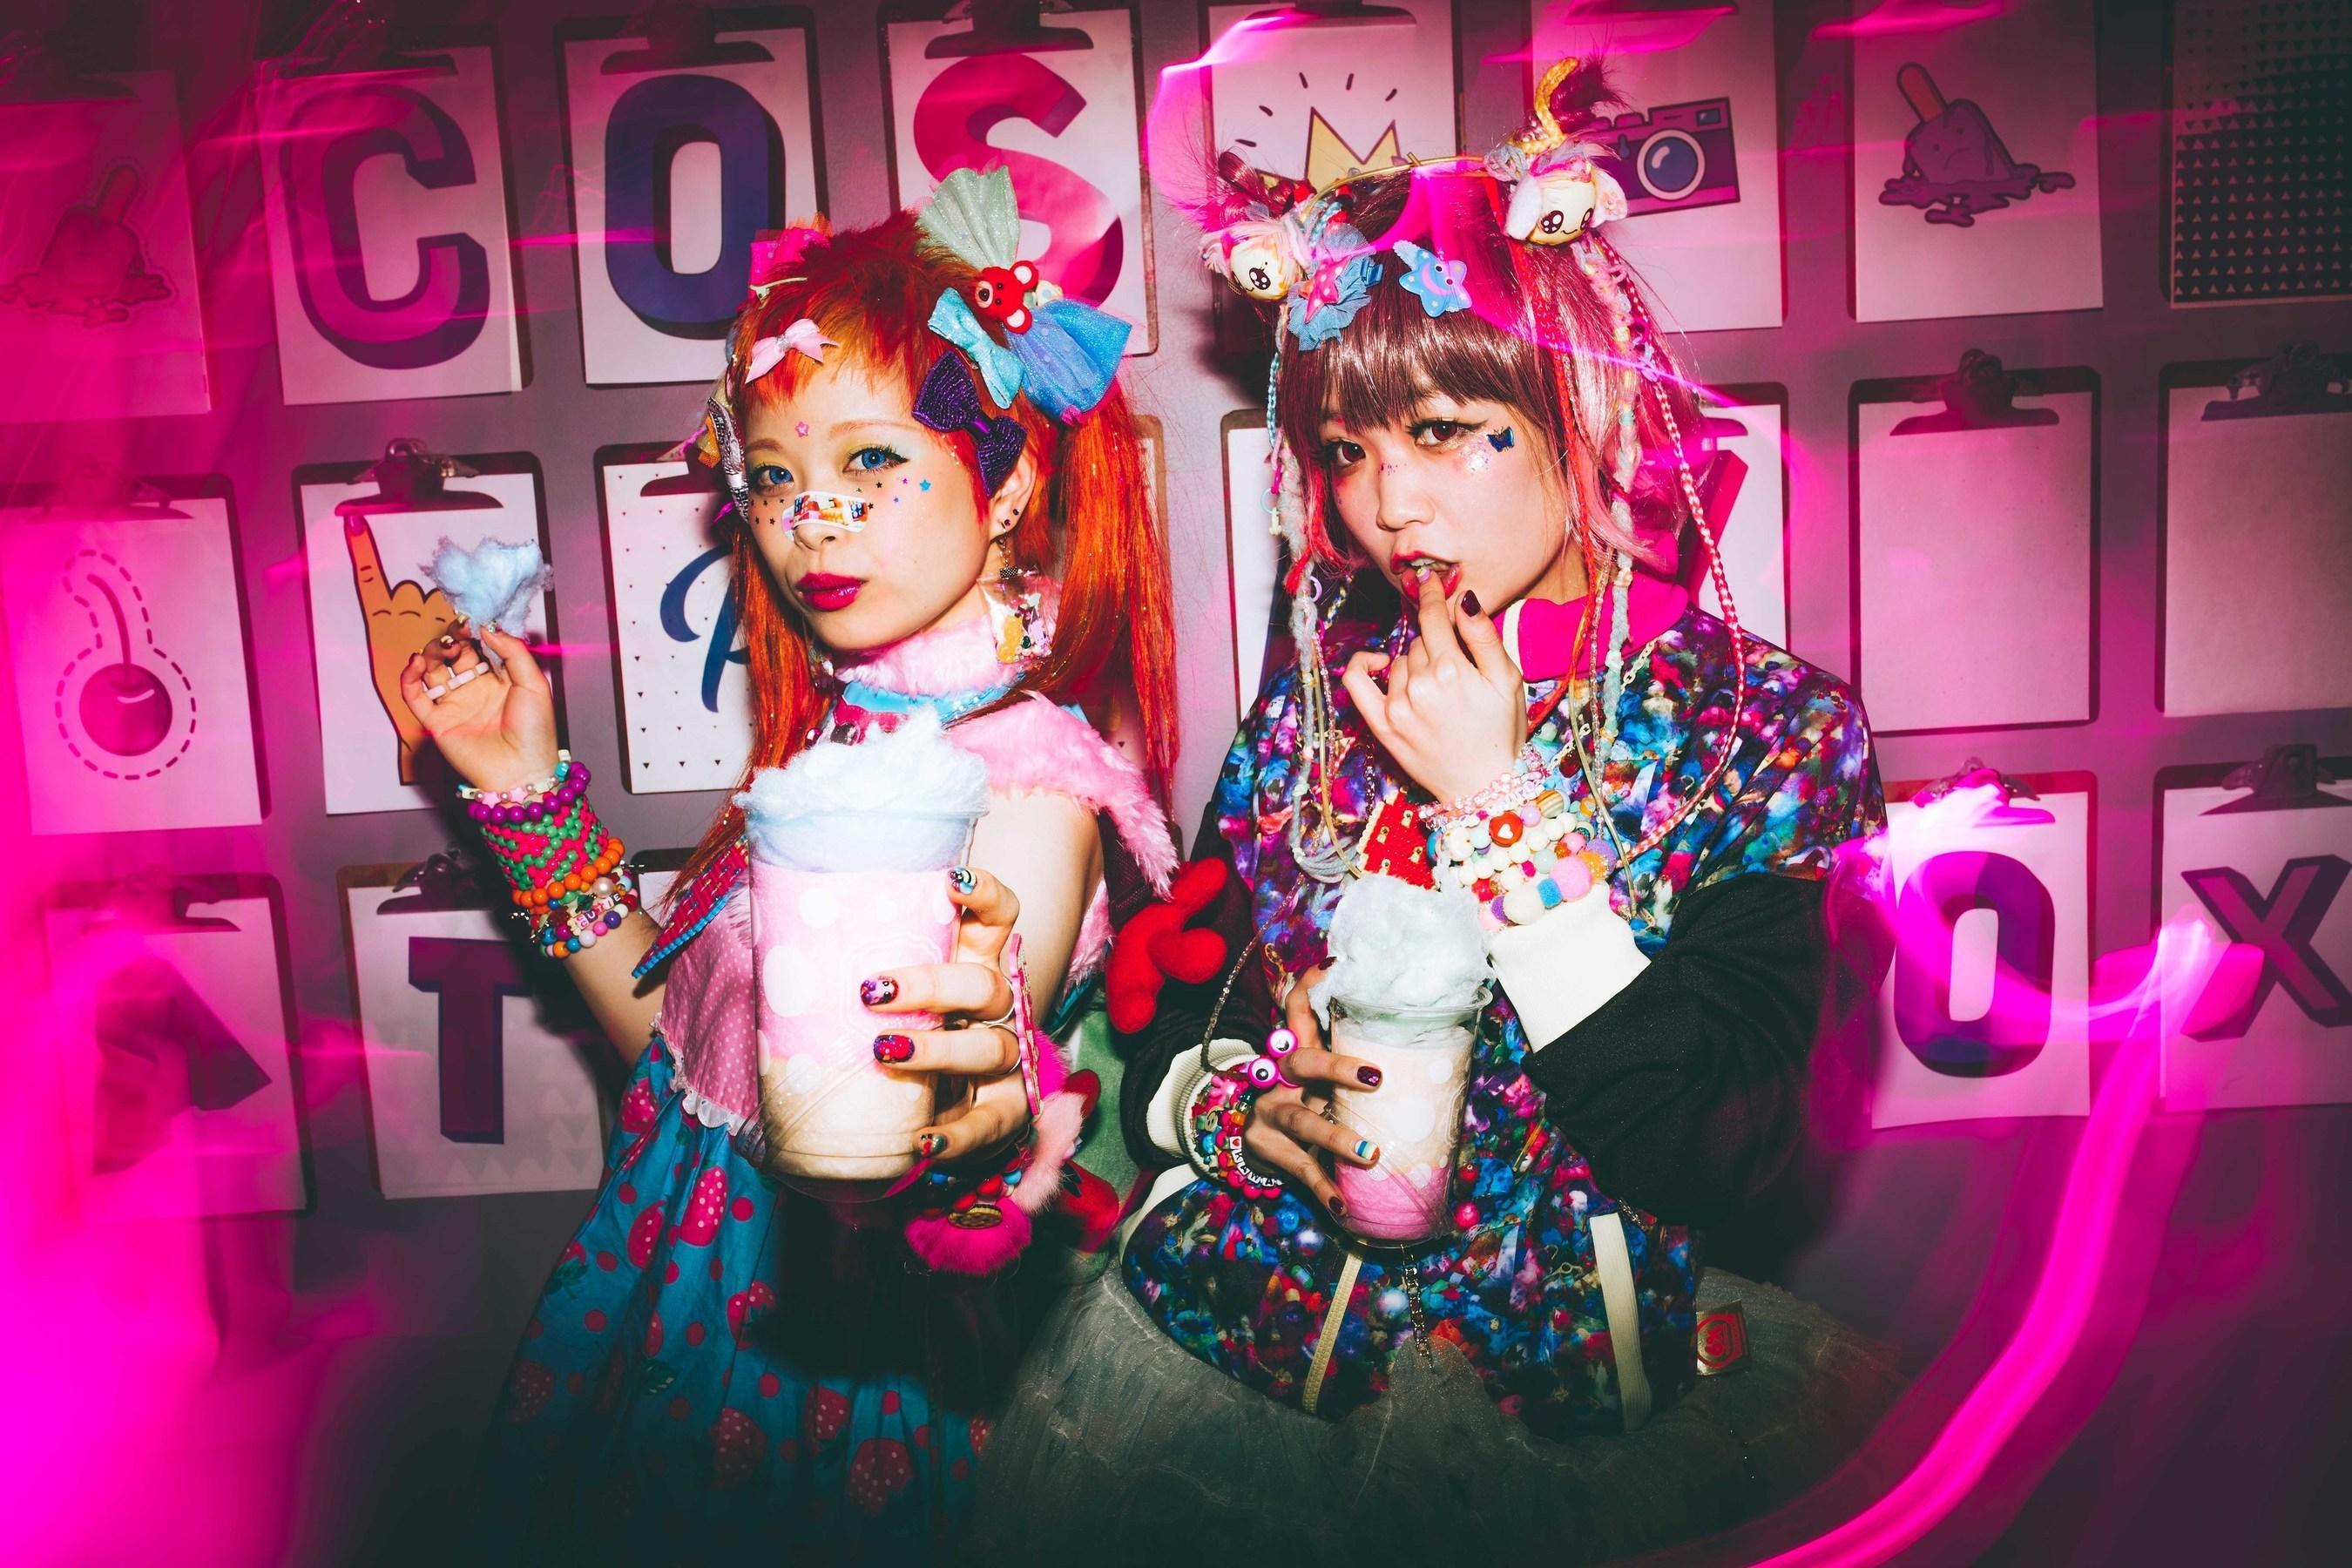 ecd9cb6c236 Moxy Debuts In Japan With